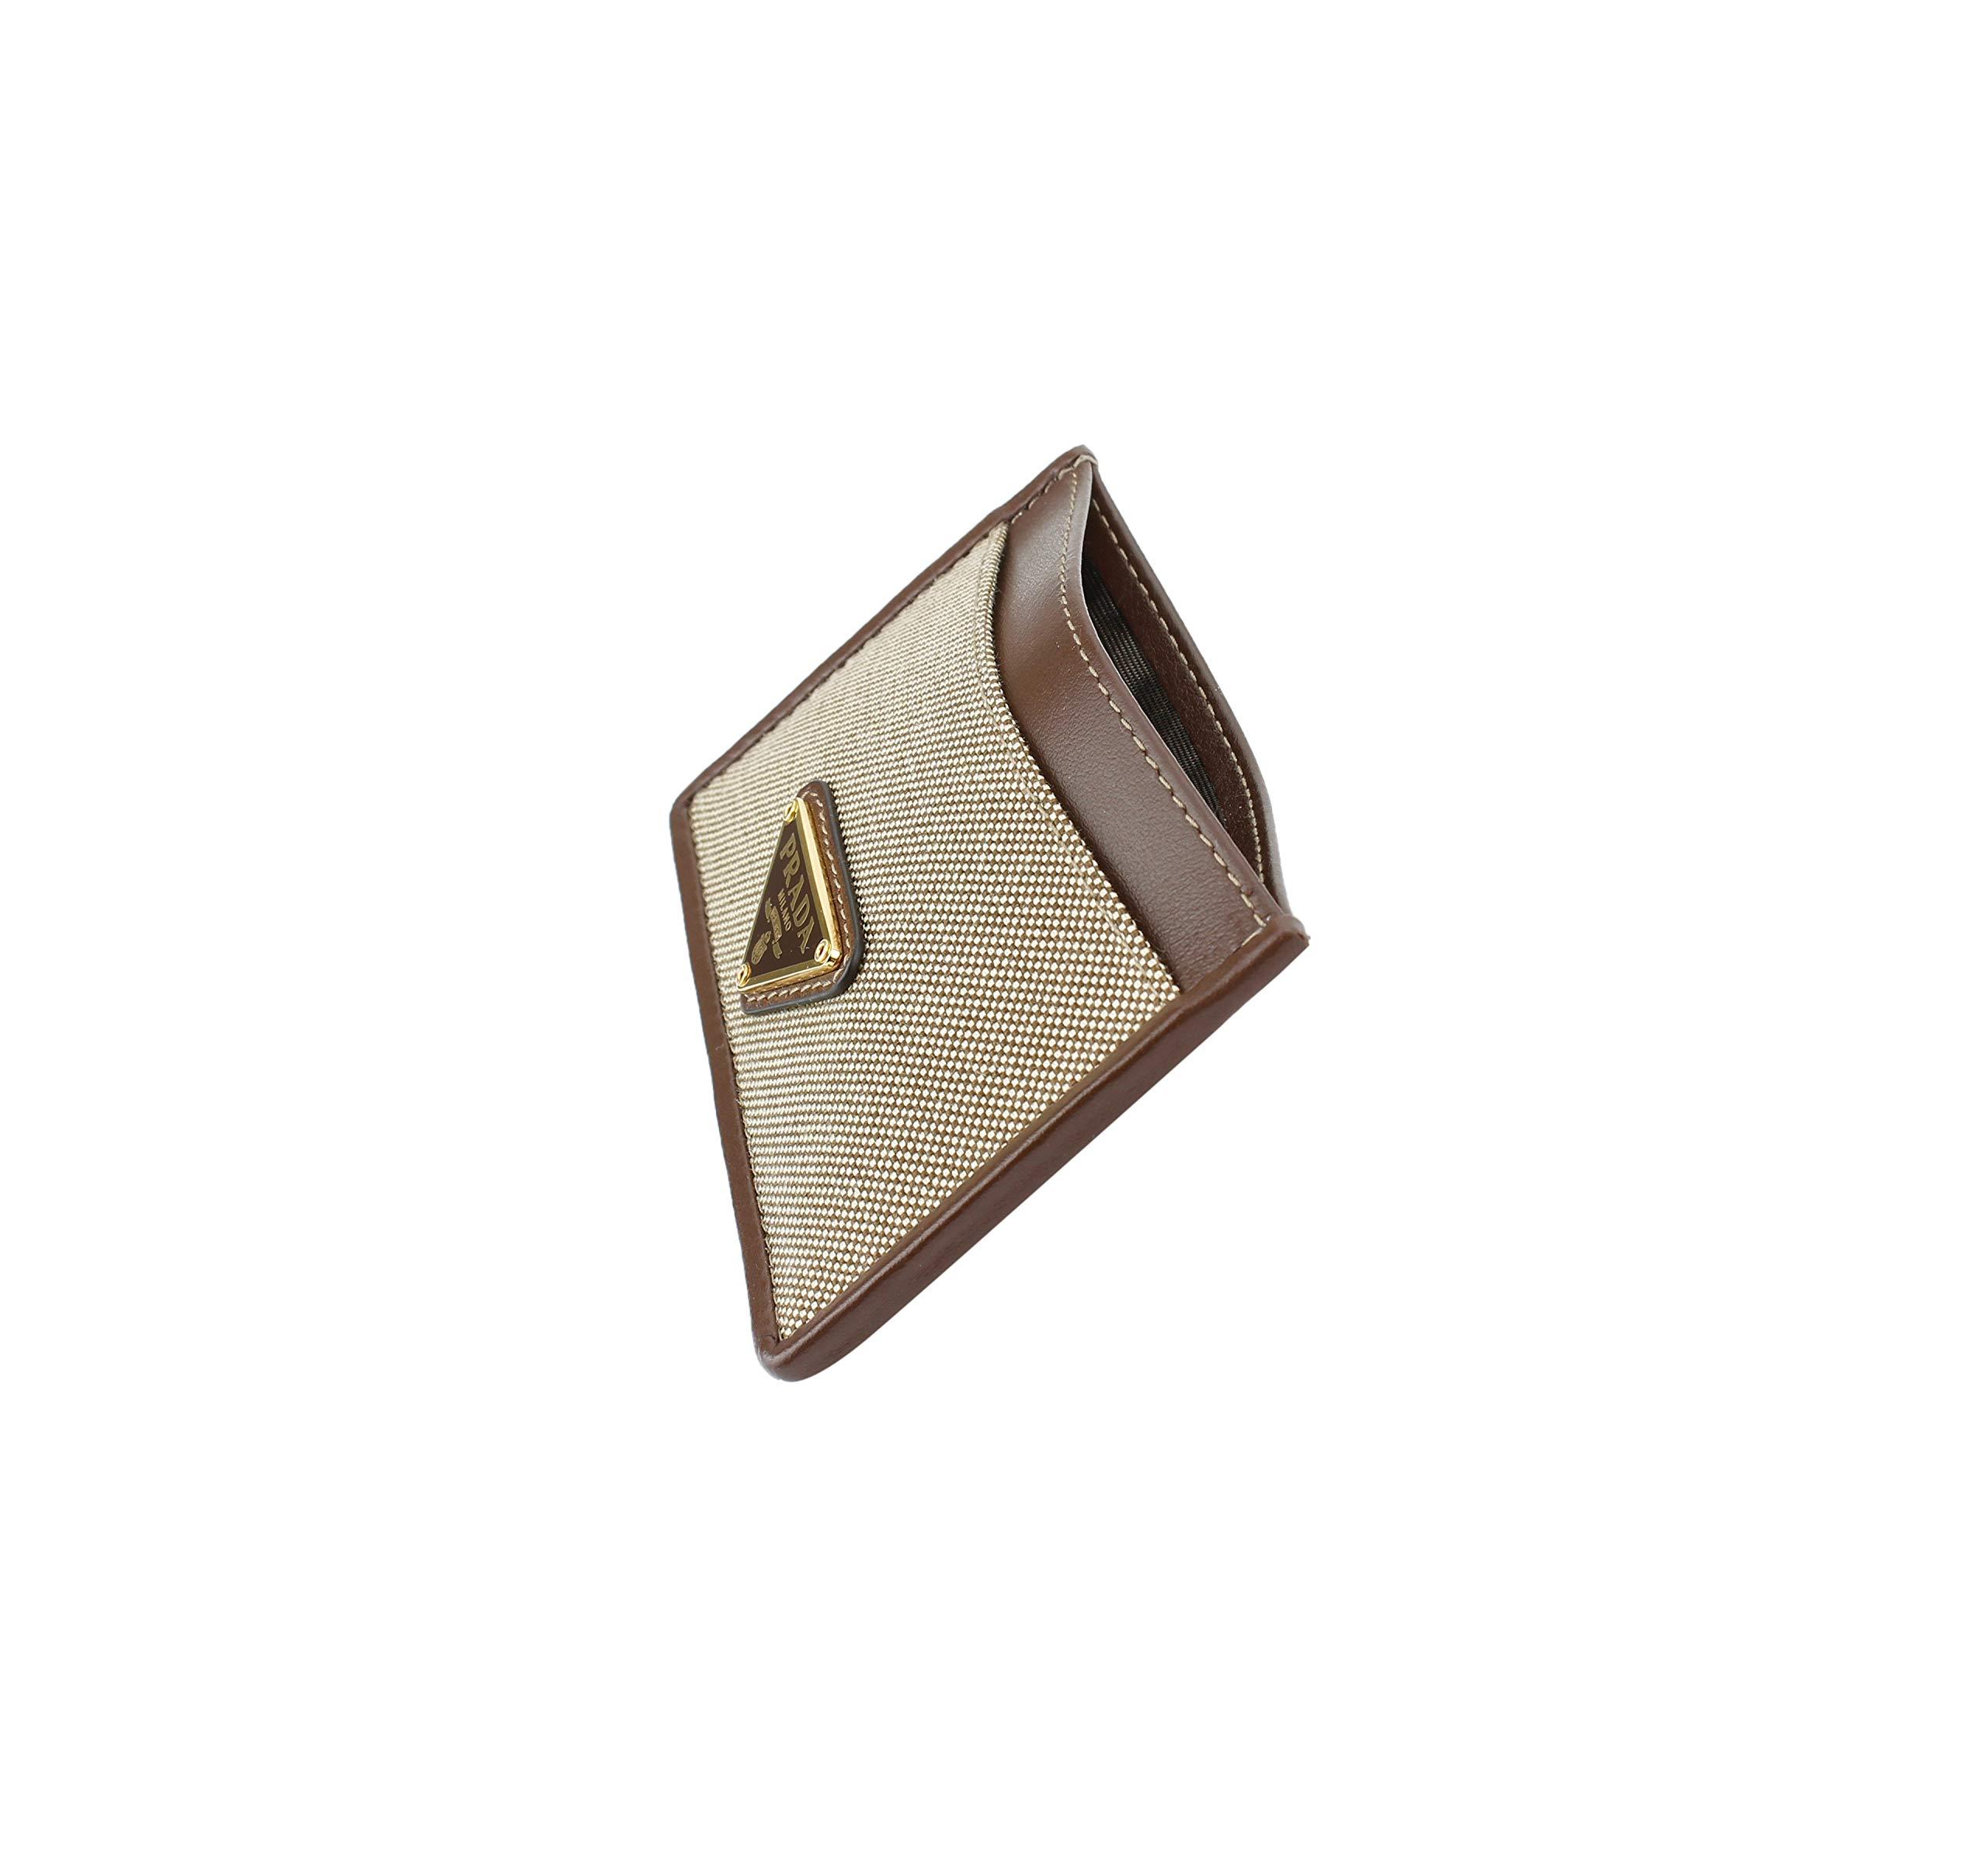 Prada Corda Canvas Logo Plaque Card Case Holder, Brown/beige by Prada (Image #3)